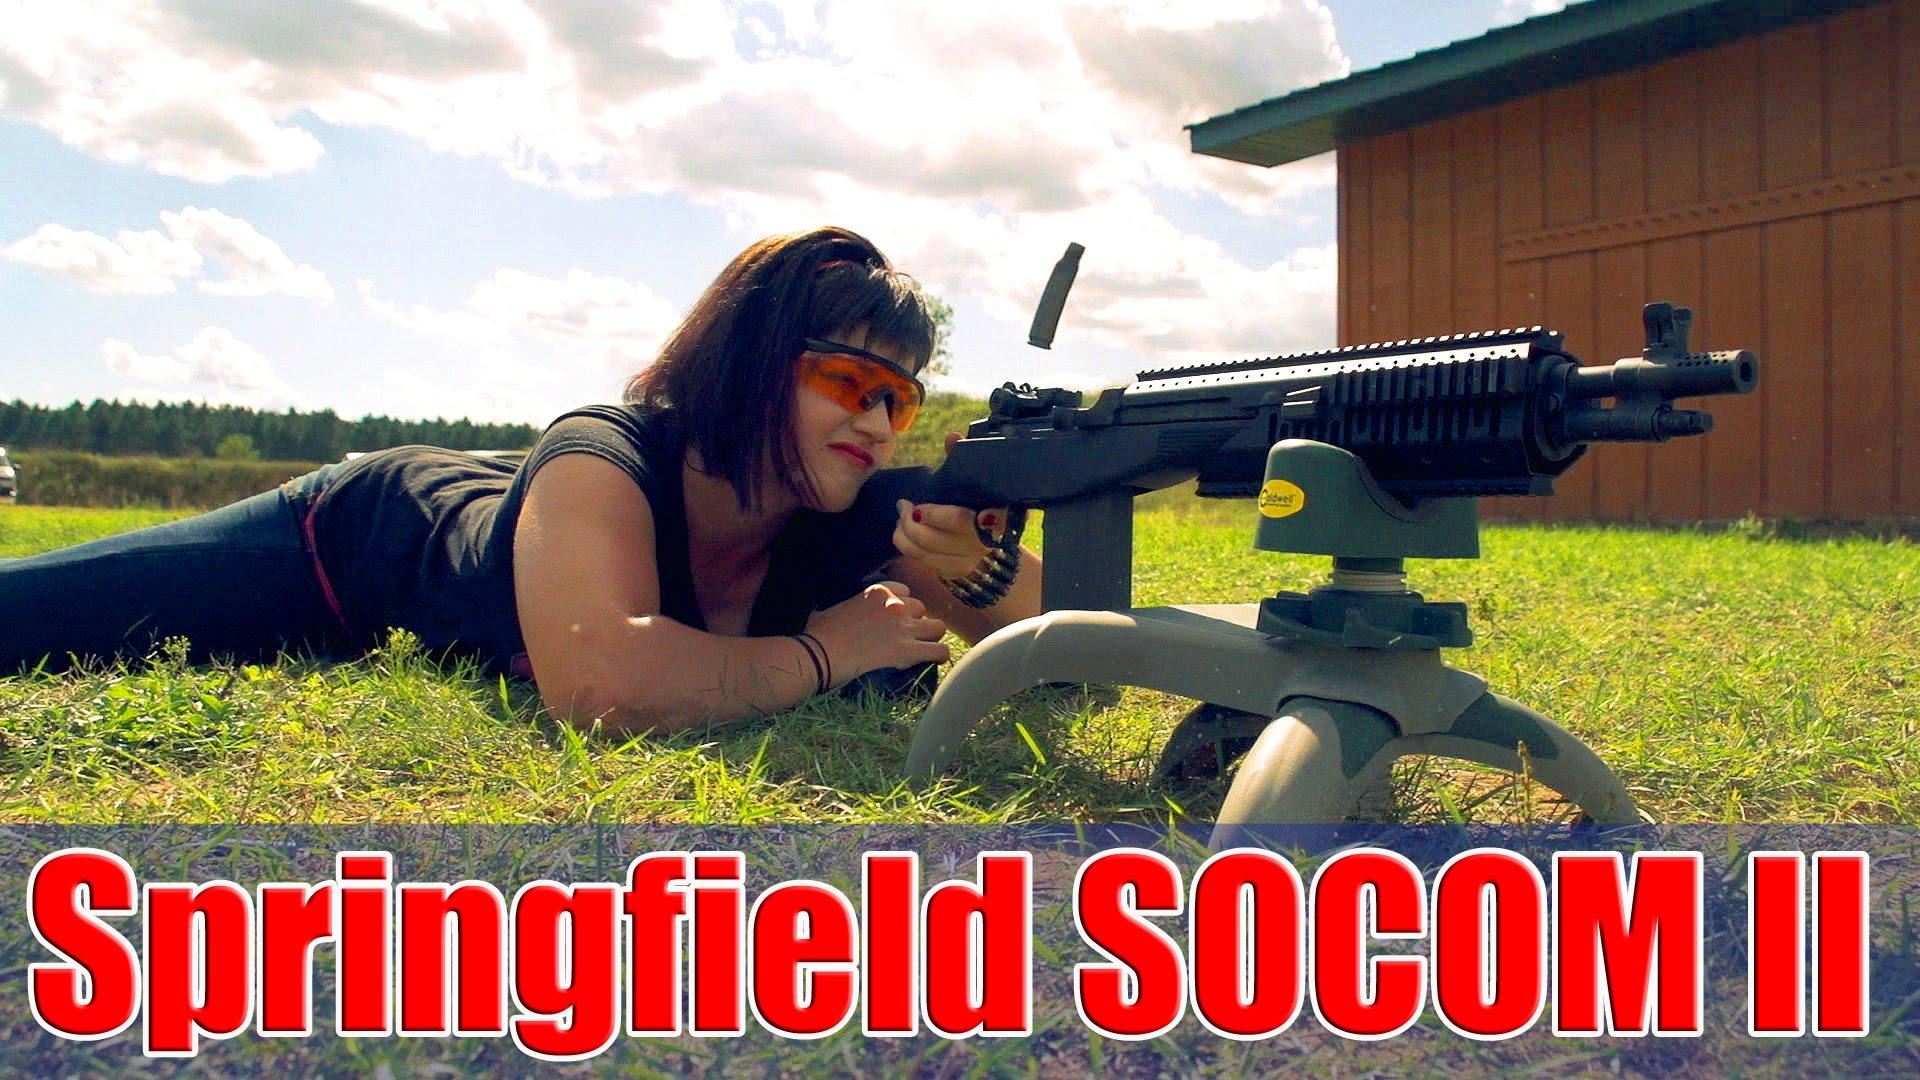 Springfield M1A SOCOM II Review